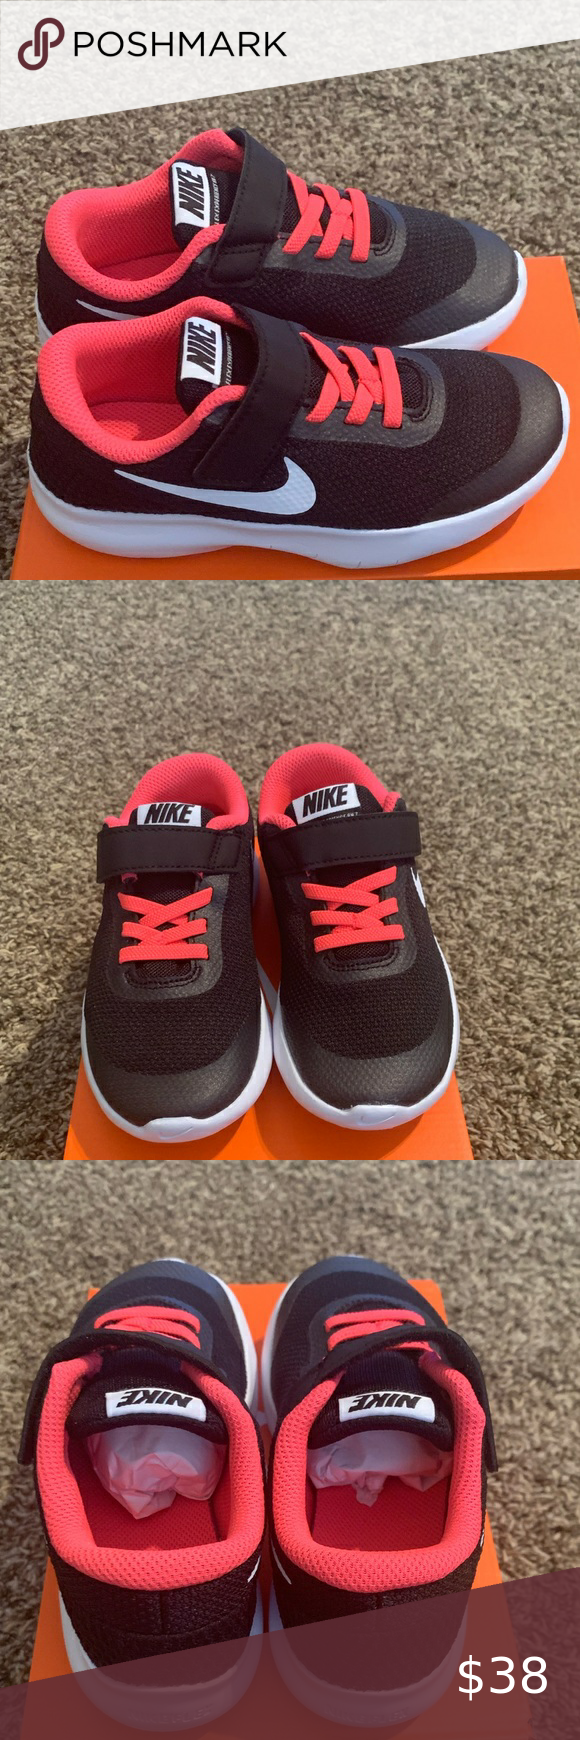 Nike Shoes 80% OFF!\u003e New Girls Nike